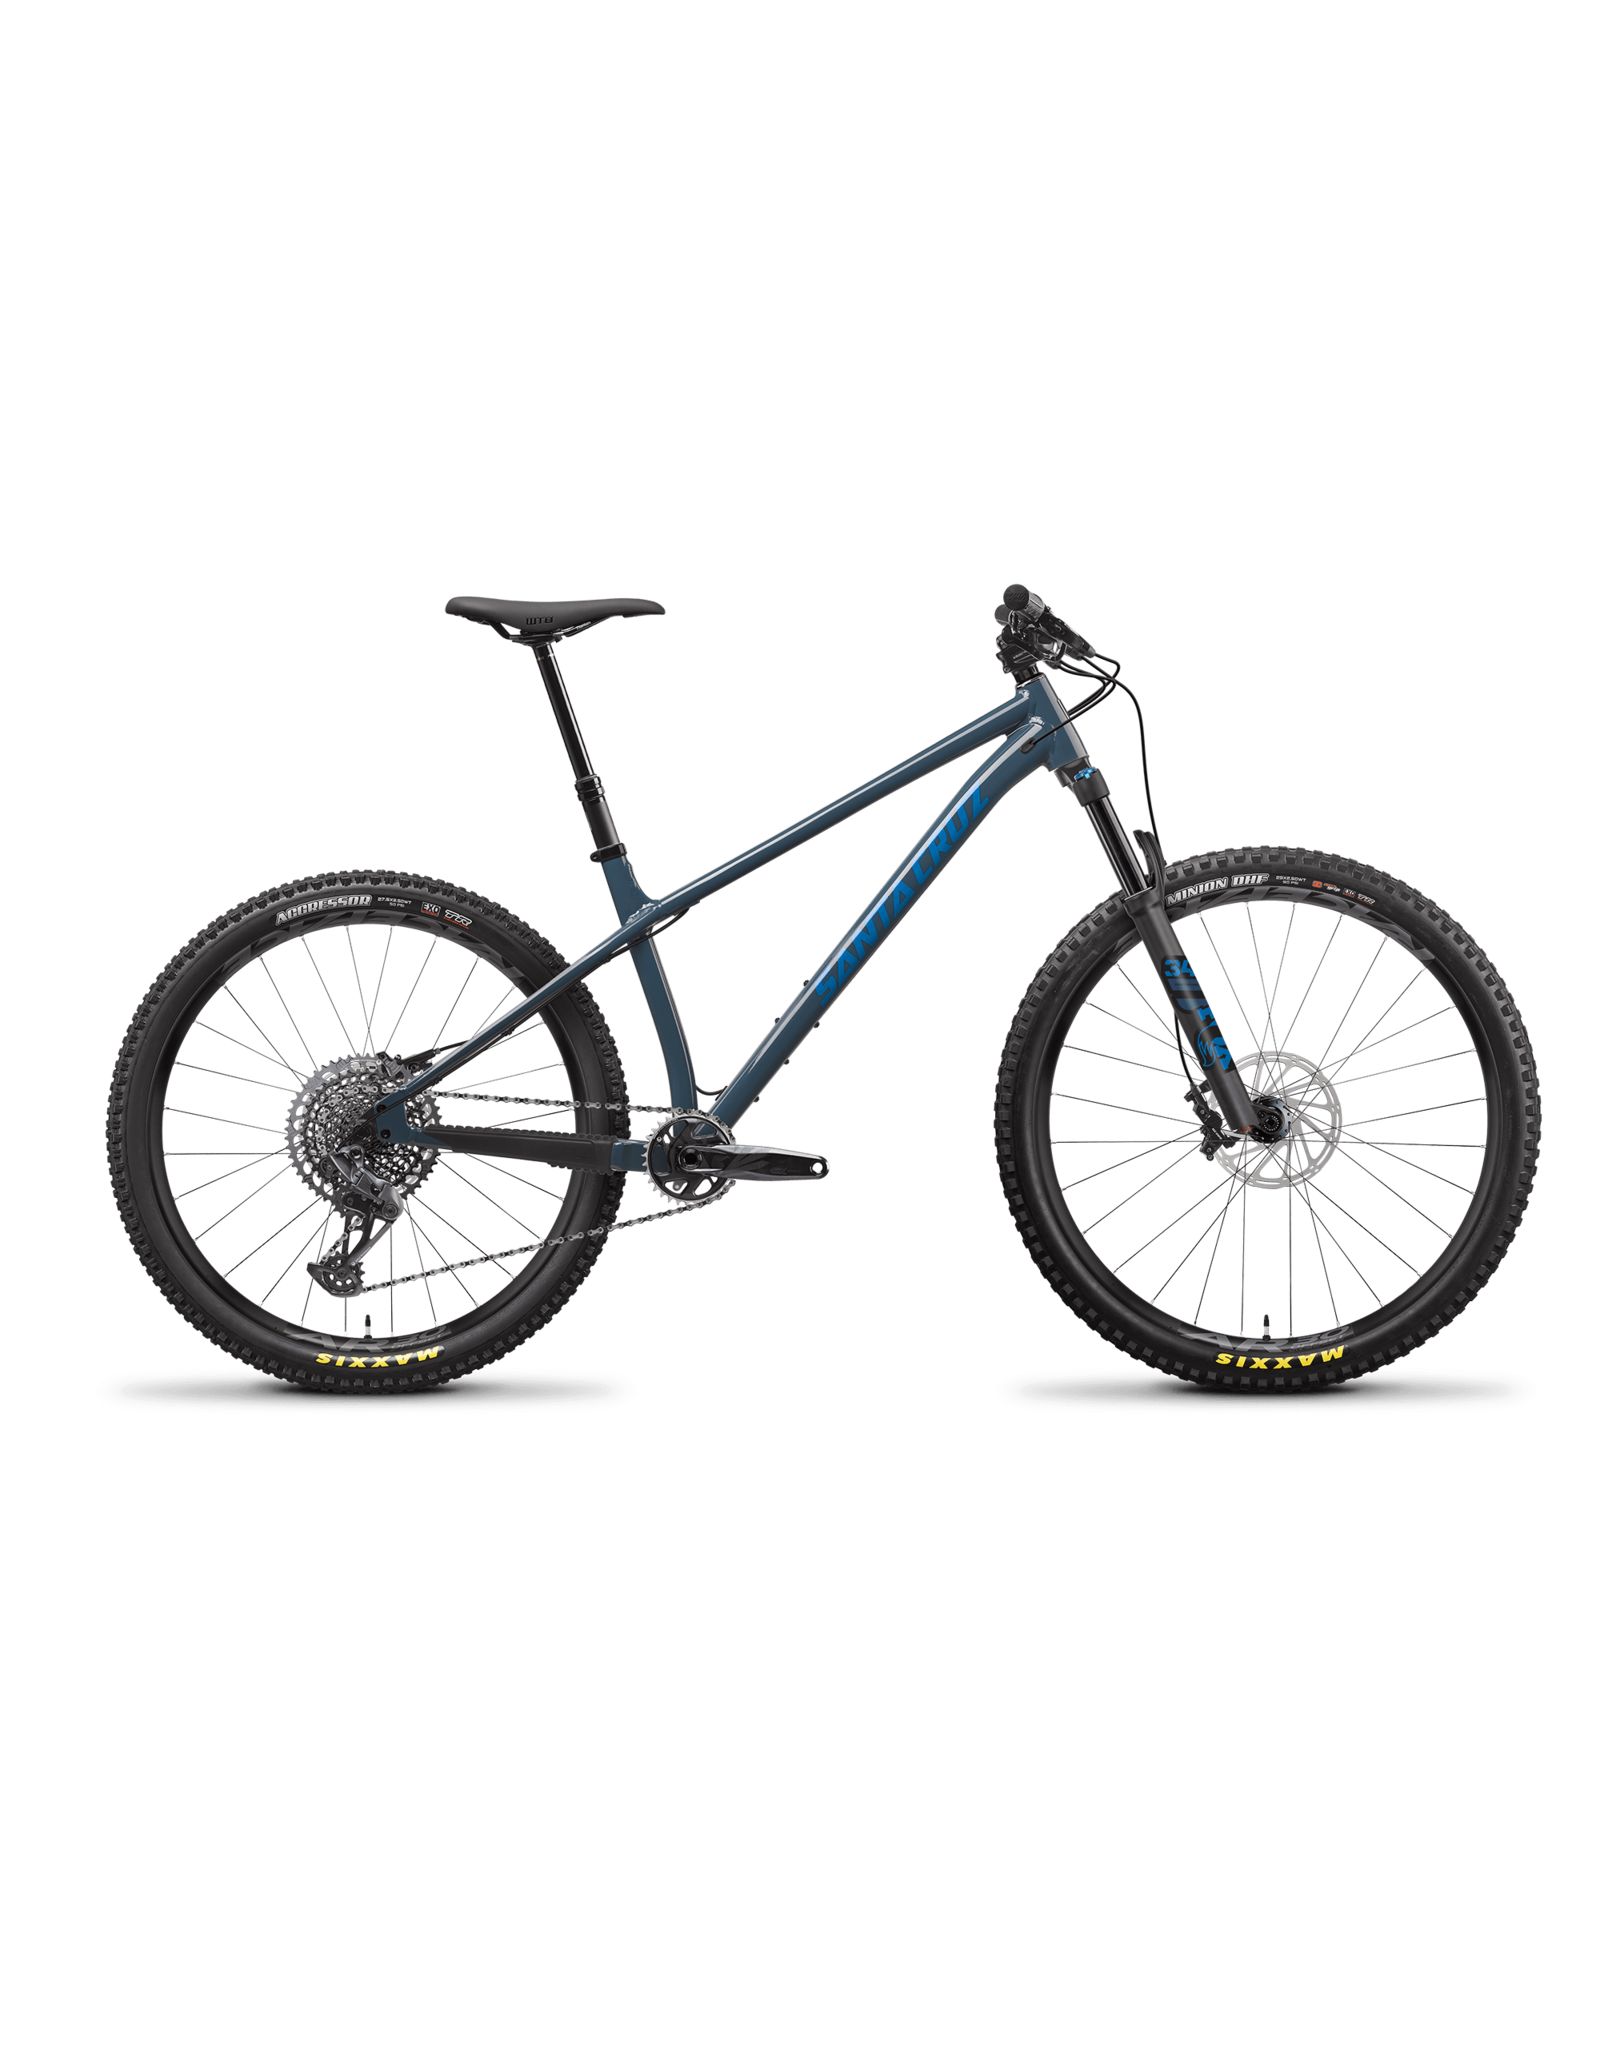 Santa Cruz 2022 Santa Cruz Chameleon 8 MX, XL, Navy, S-Kit